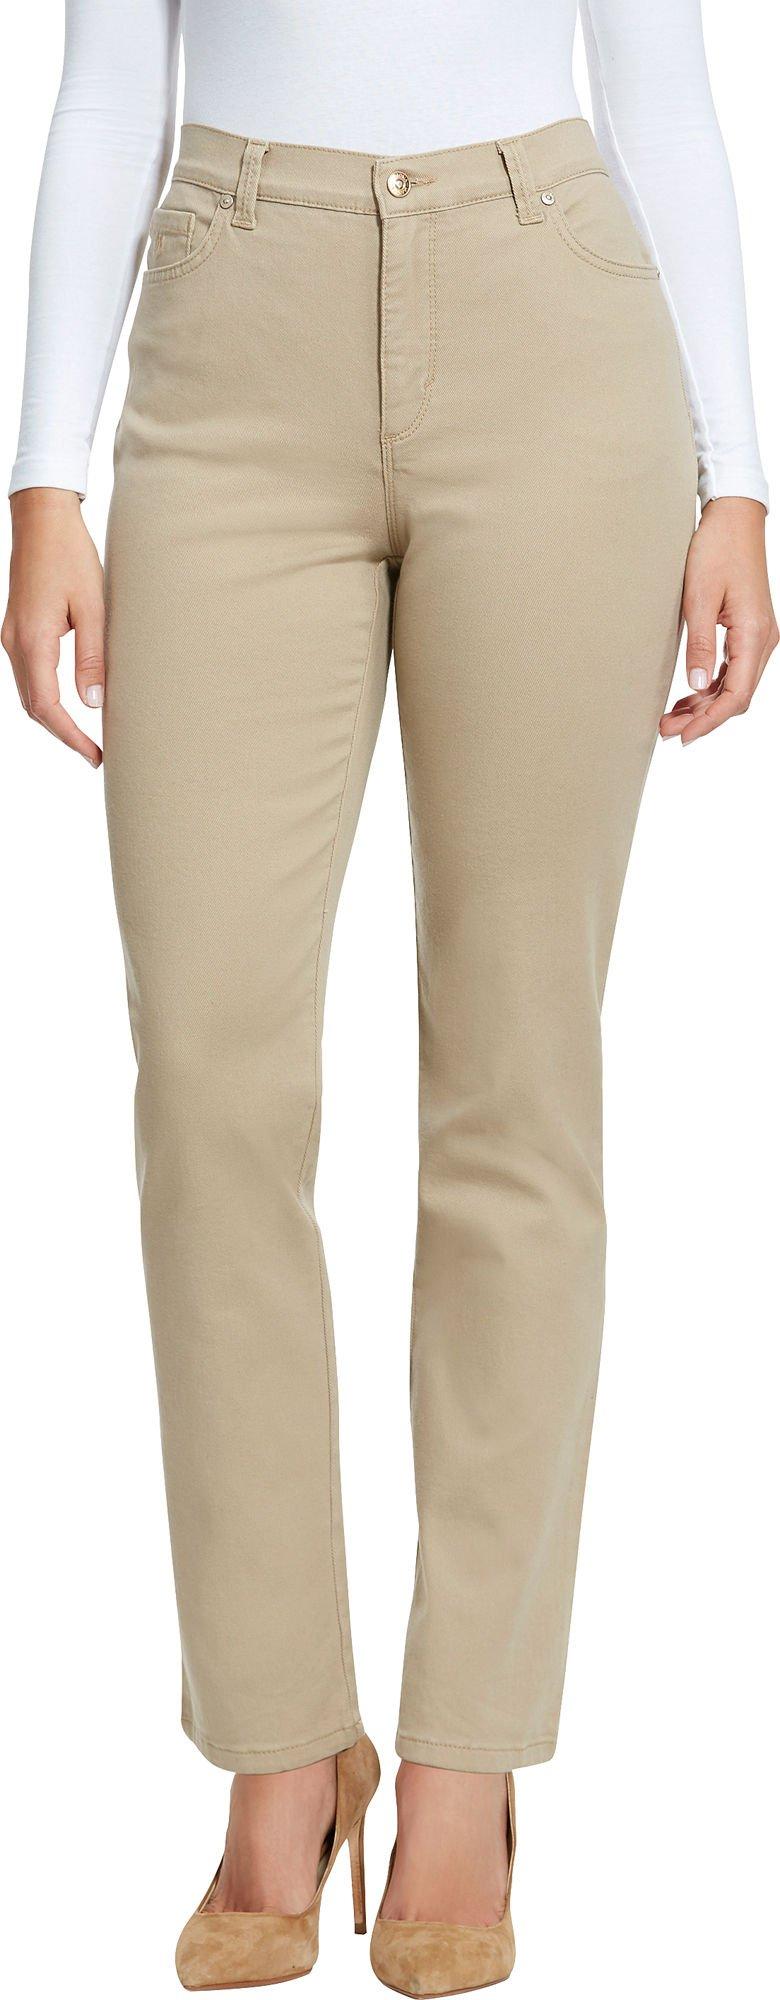 Gloria Vanderbilt Amanda Colored Straight Leg Denim Jeans Perfect Khaki 14 Short